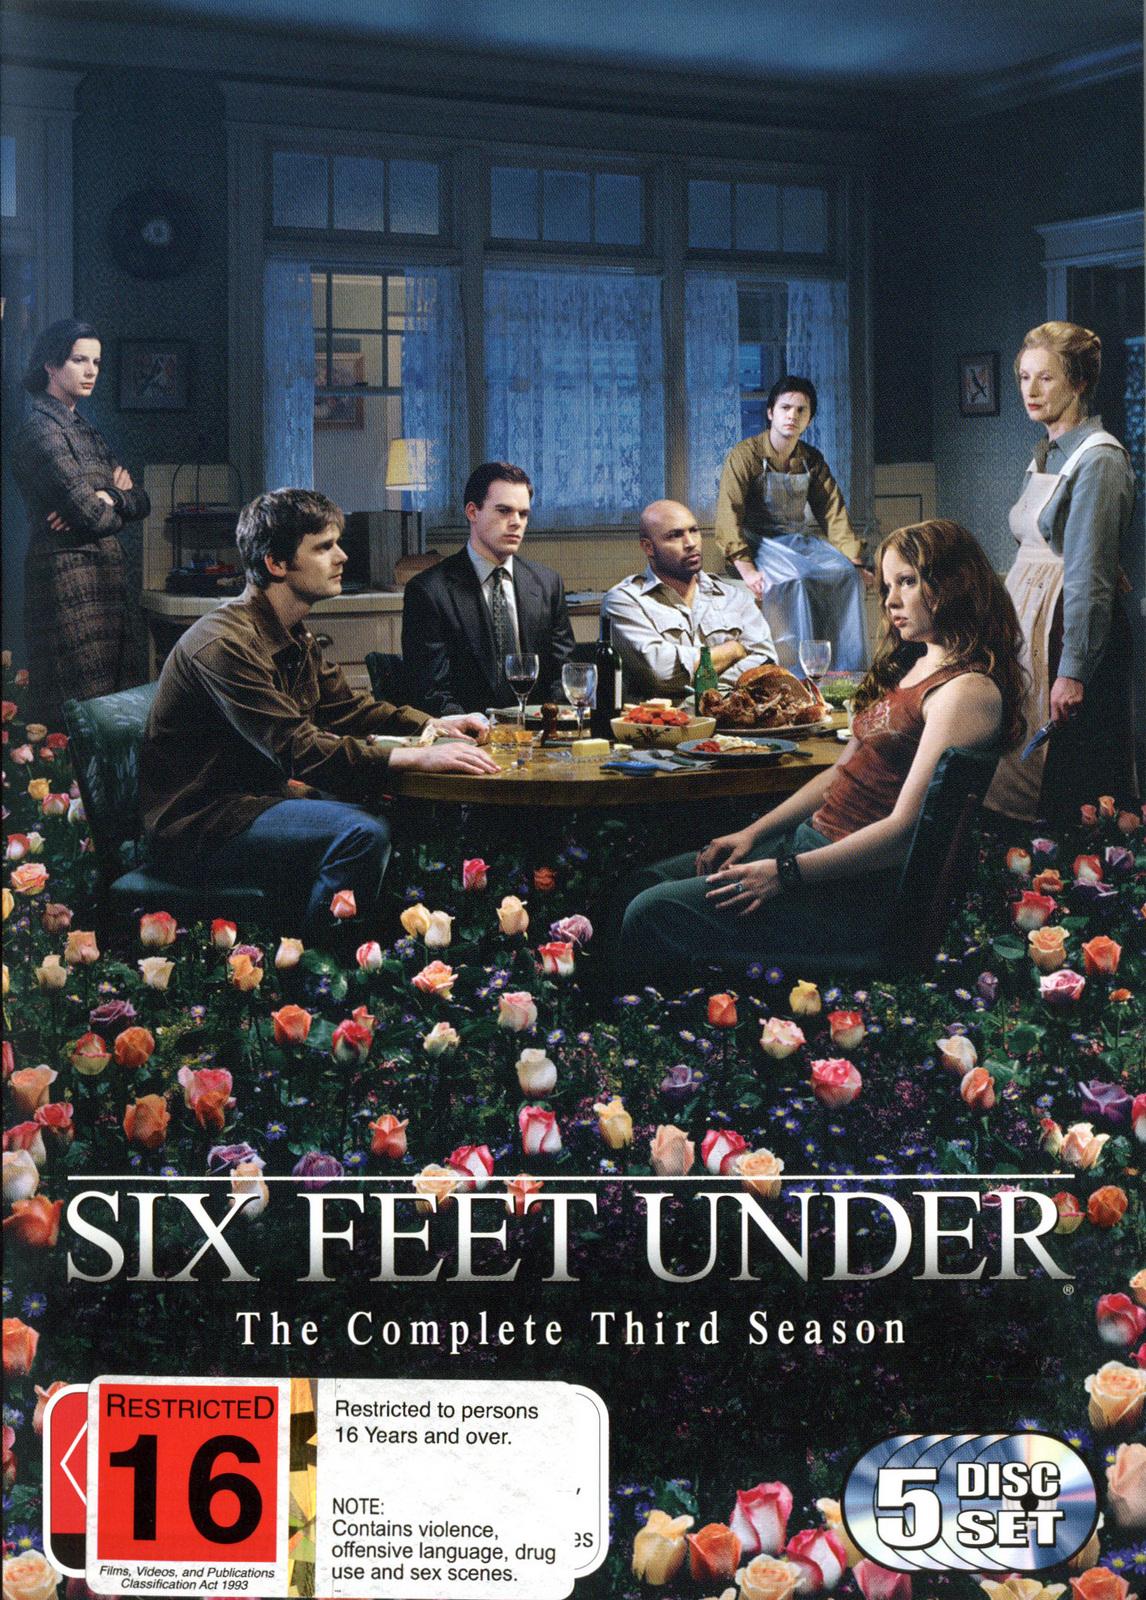 Six Feet Under - Complete Third Season (5 Disc Box Set) on DVD image